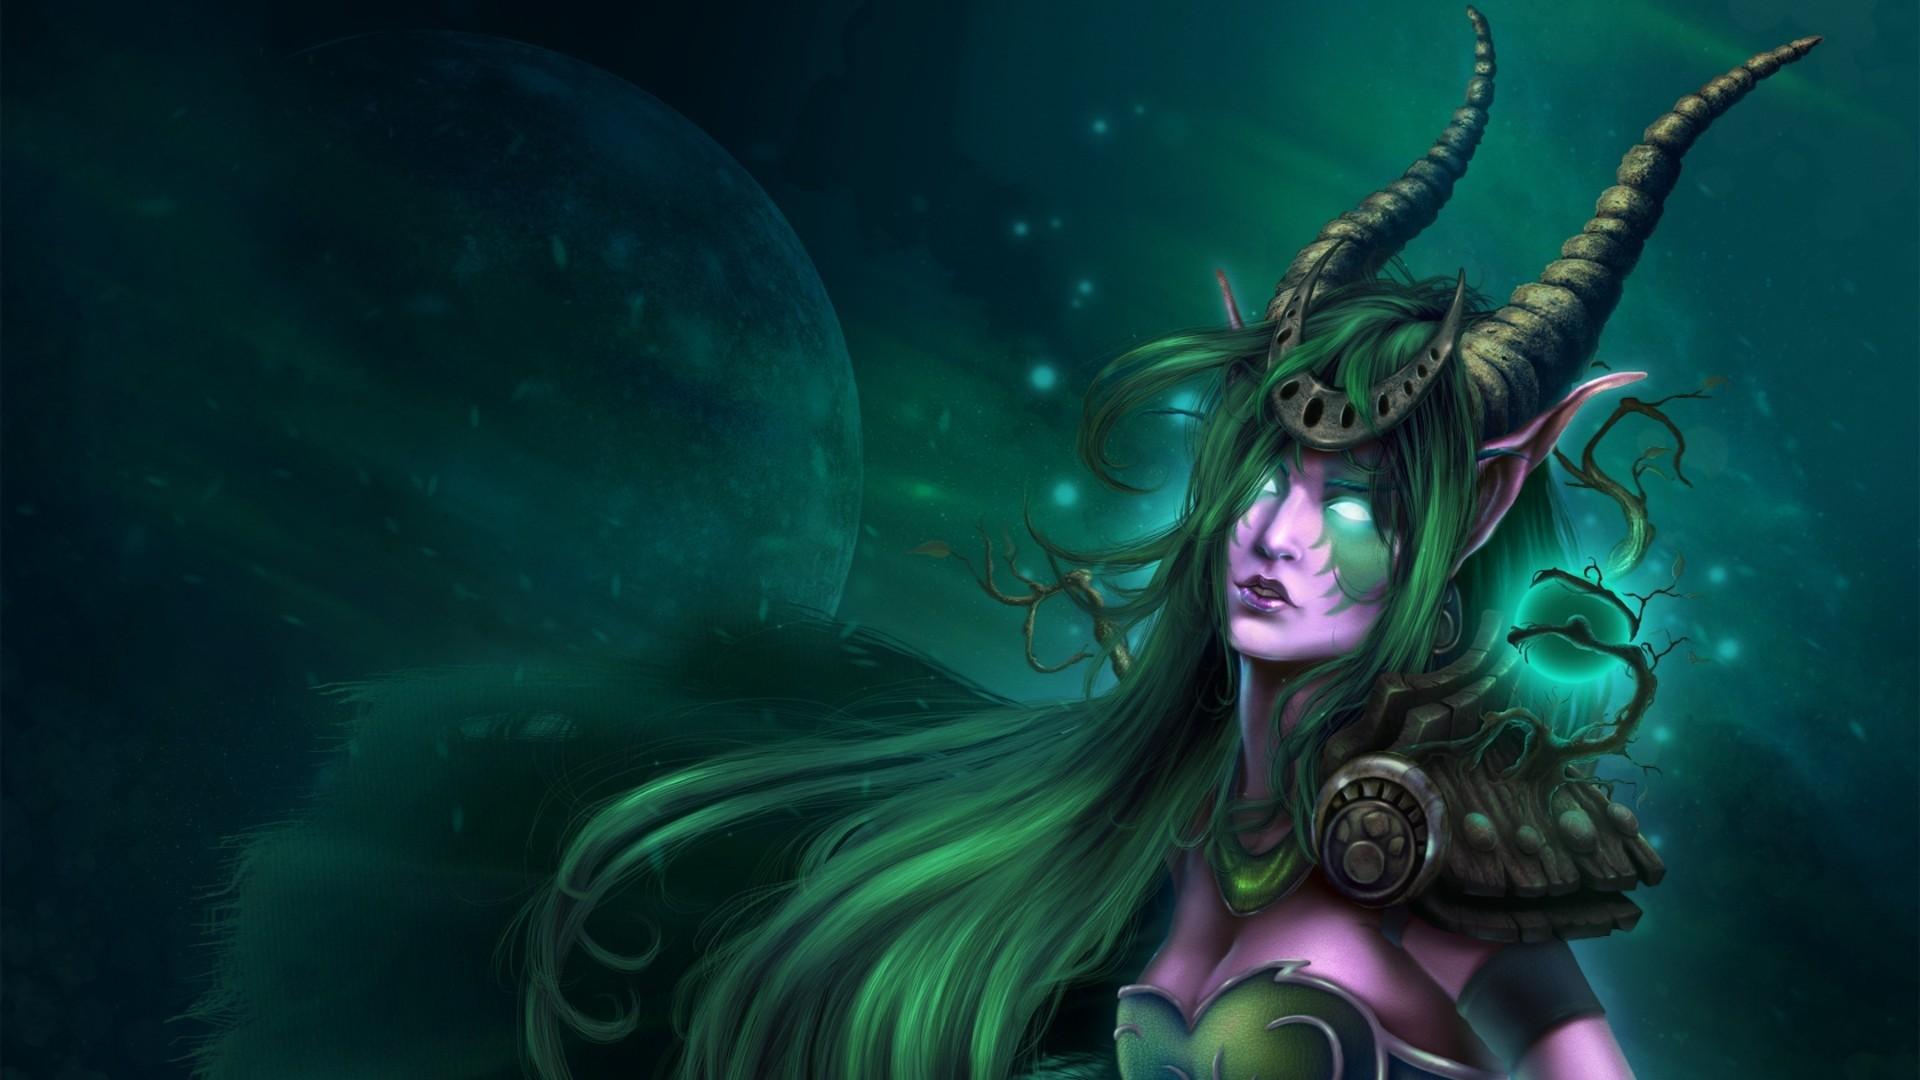 World Of Warcraft PC Wallpaper